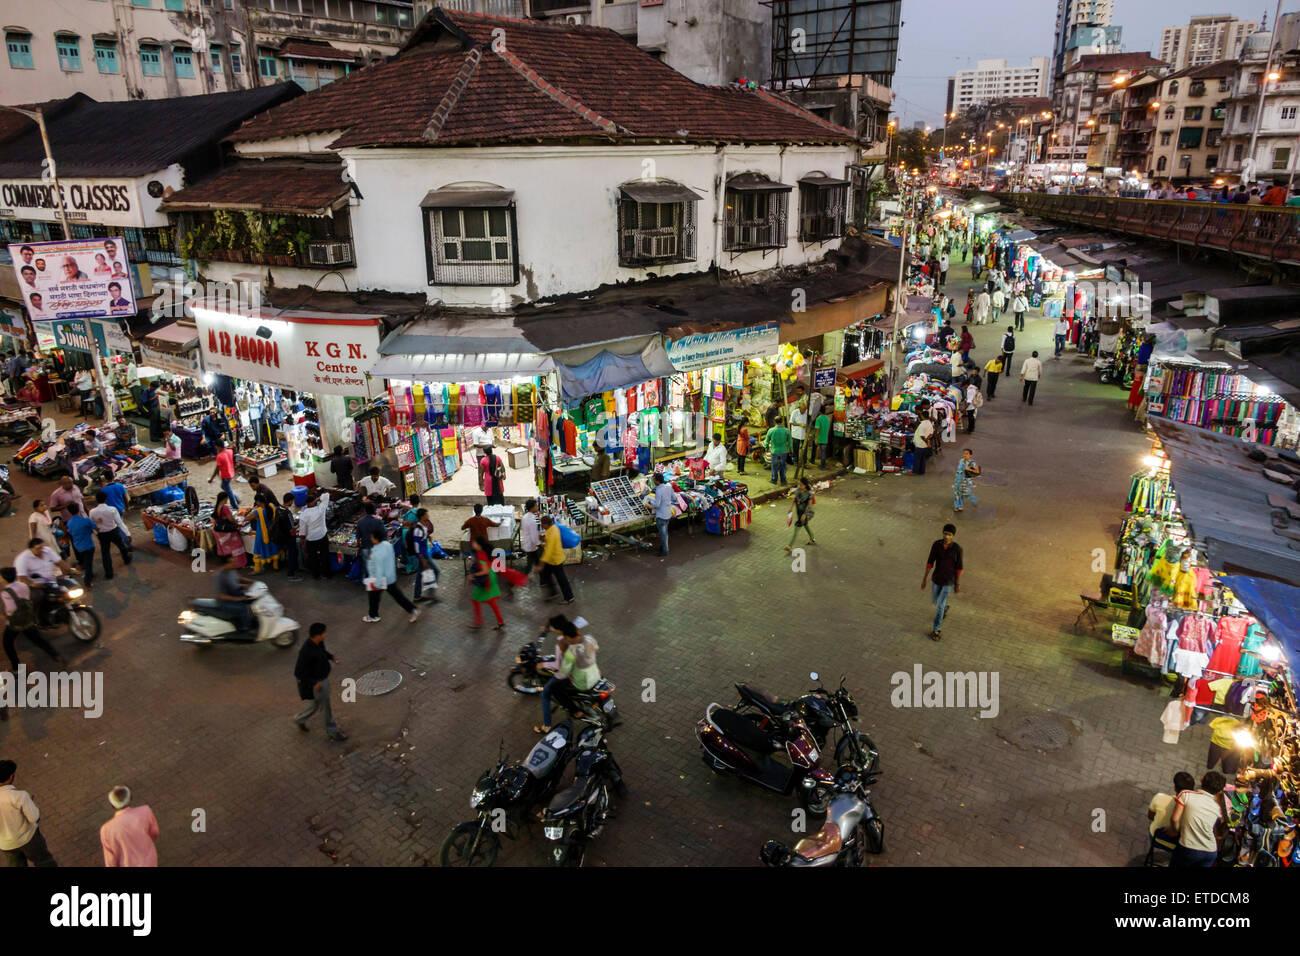 Mumbai Inde Asie indienne Grant Road East Bharat Nagar nuit vie nocturne shopping street market vendors piétons Photo Stock